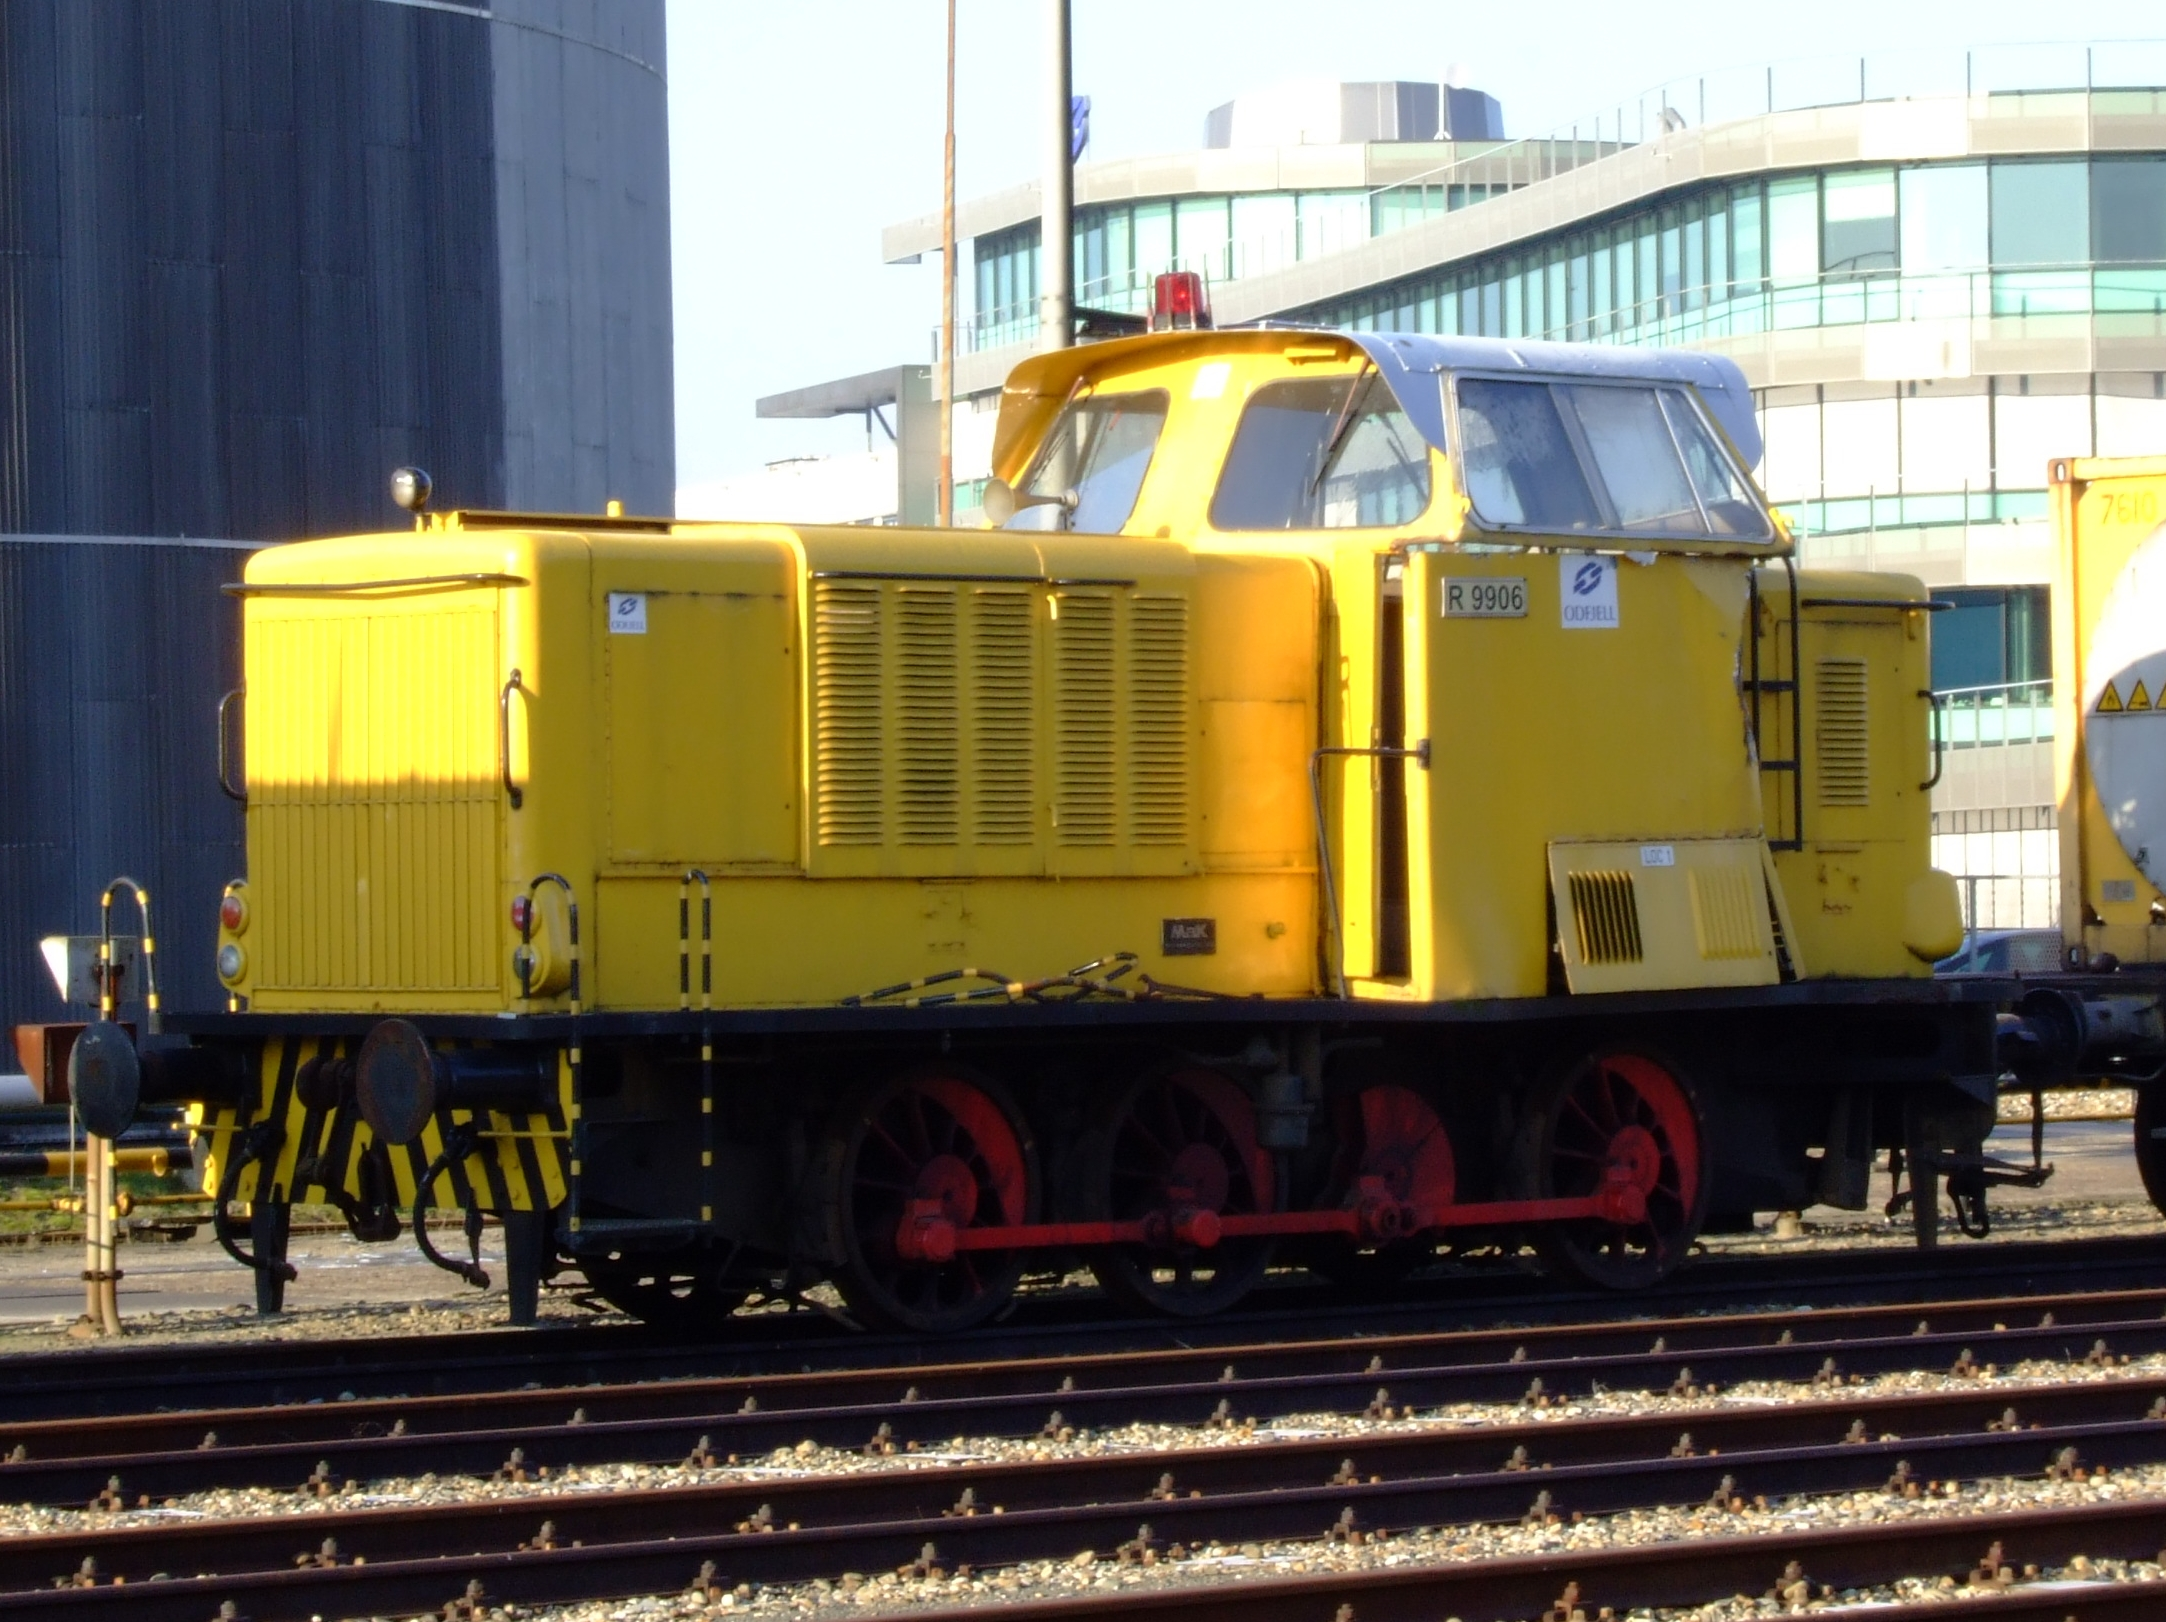 file diesel locomotive r9905 loc 1 at odfjell terminal europoort rotterdam holland pic1 jpg. Black Bedroom Furniture Sets. Home Design Ideas